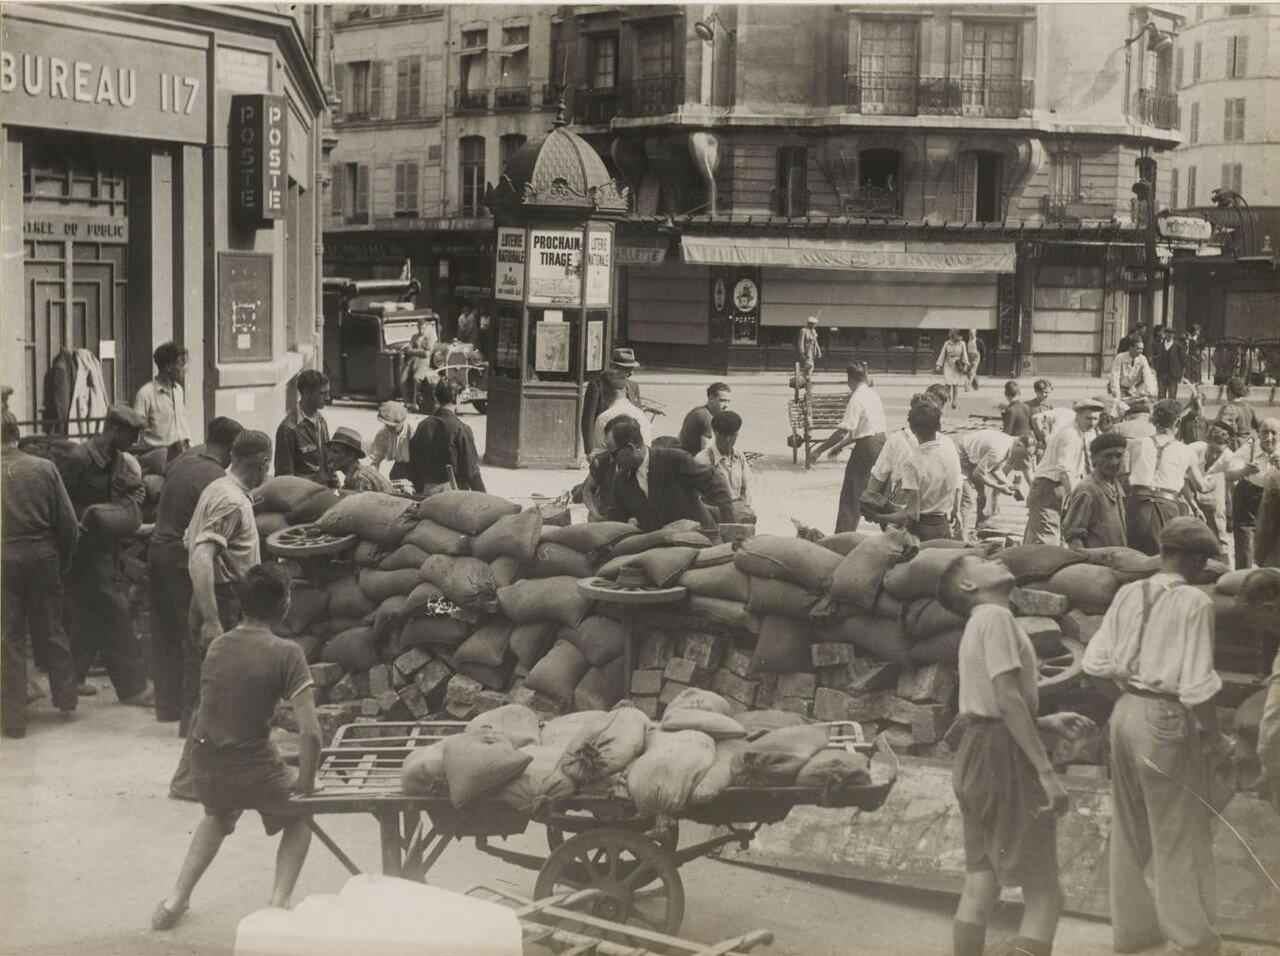 22-25 августа. Строительство баррикад на Риволи, на углу площади Сент-Оппортюн